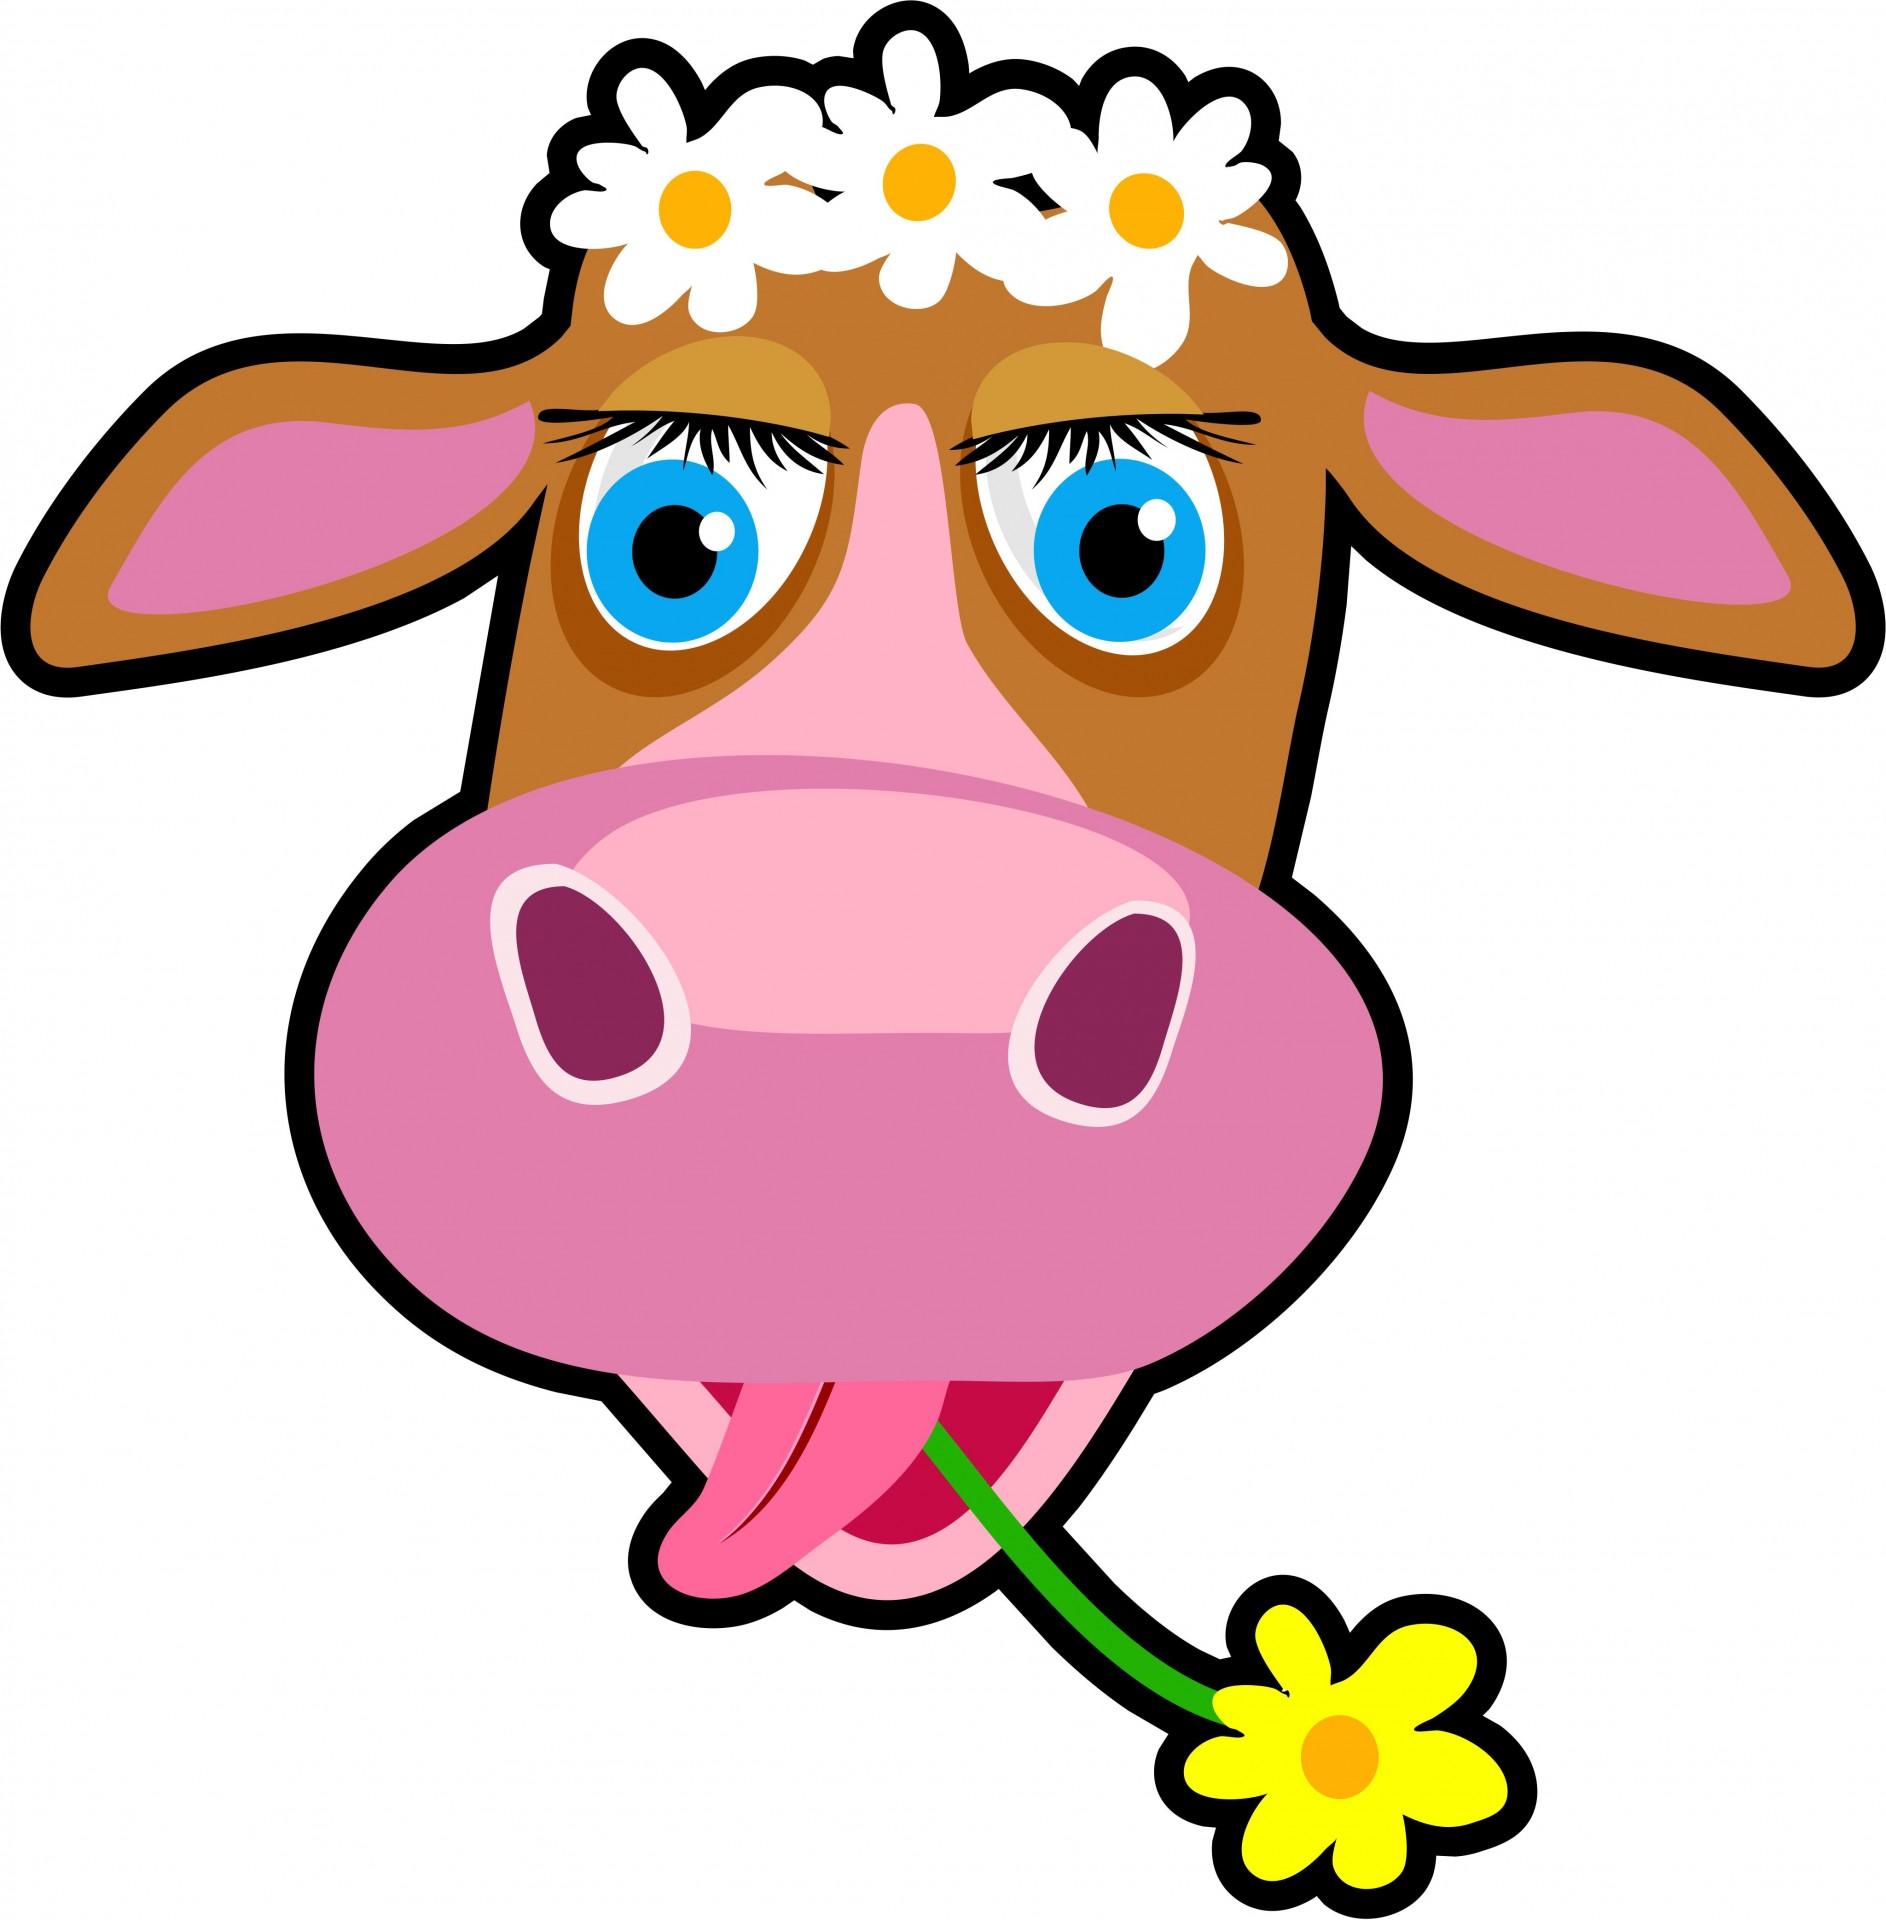 Announcements clipart cartoon. Cow free stock photo